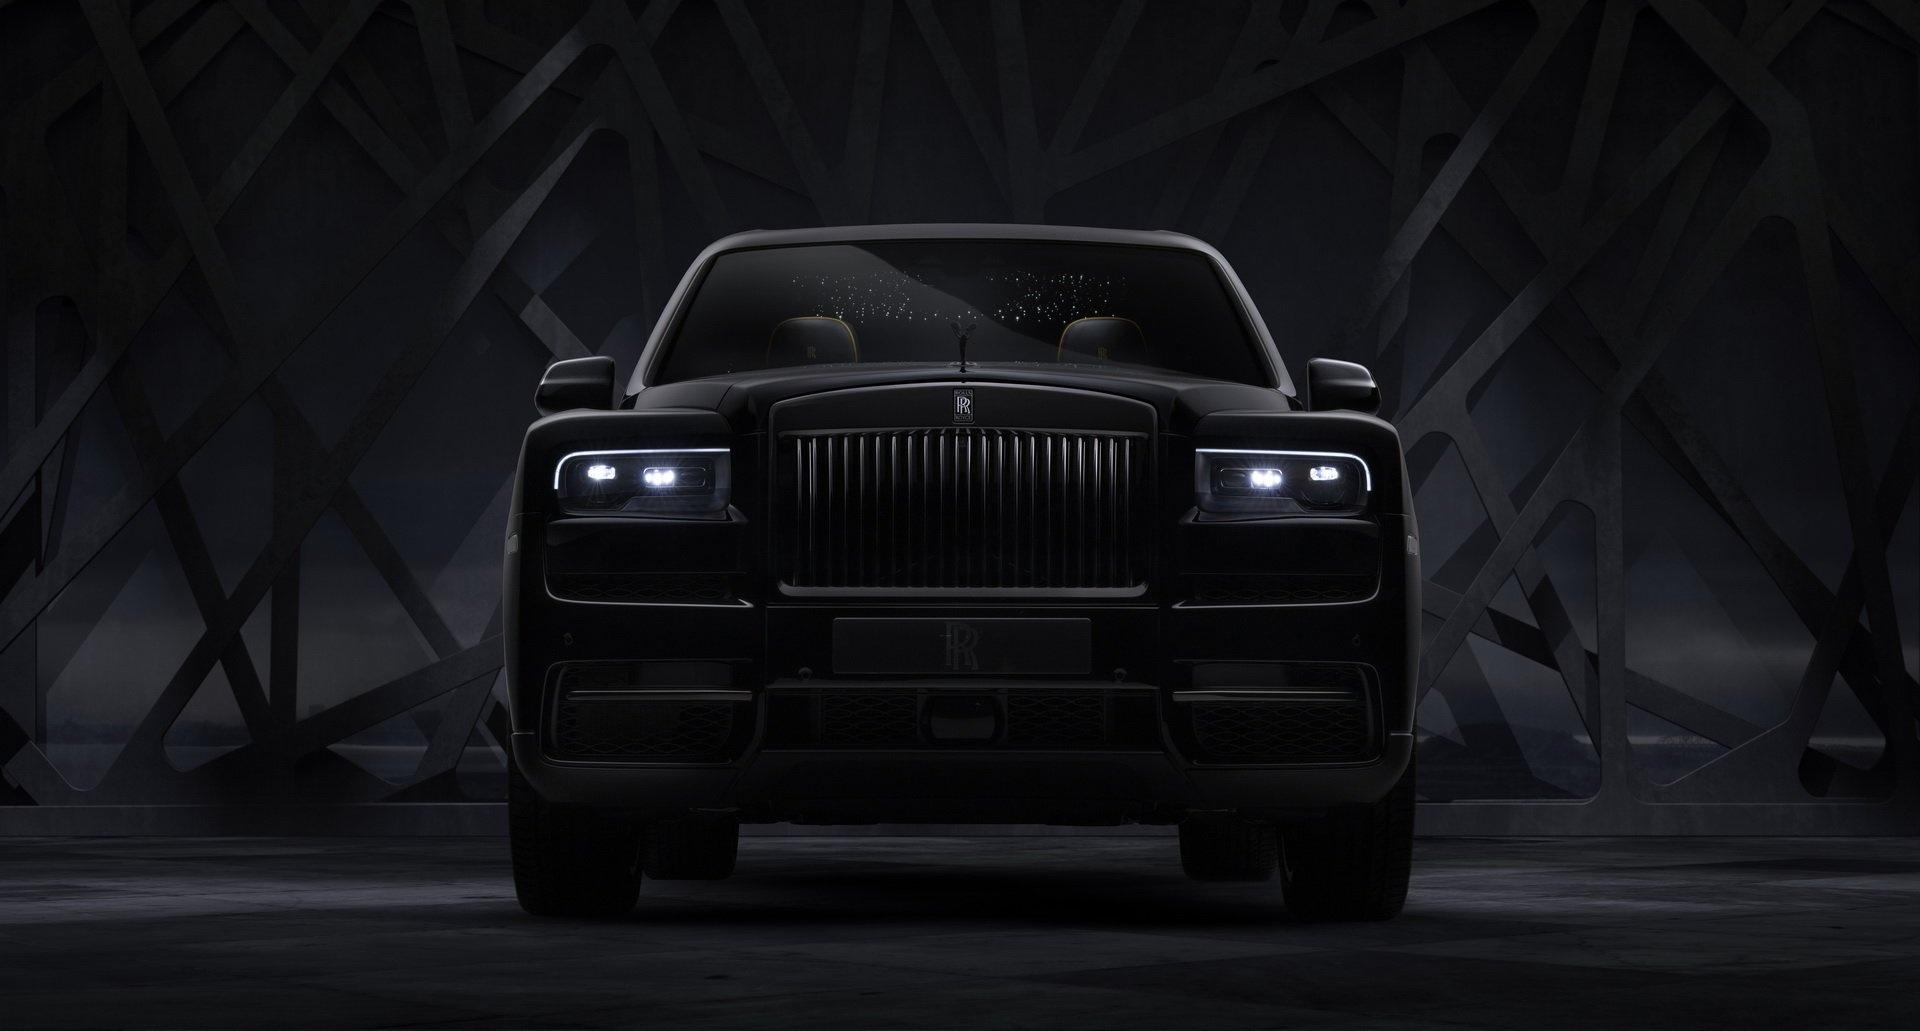 SUV sieu sang cua Rolls-Royce ban dac biet Black Badge ra mat hinh anh 4